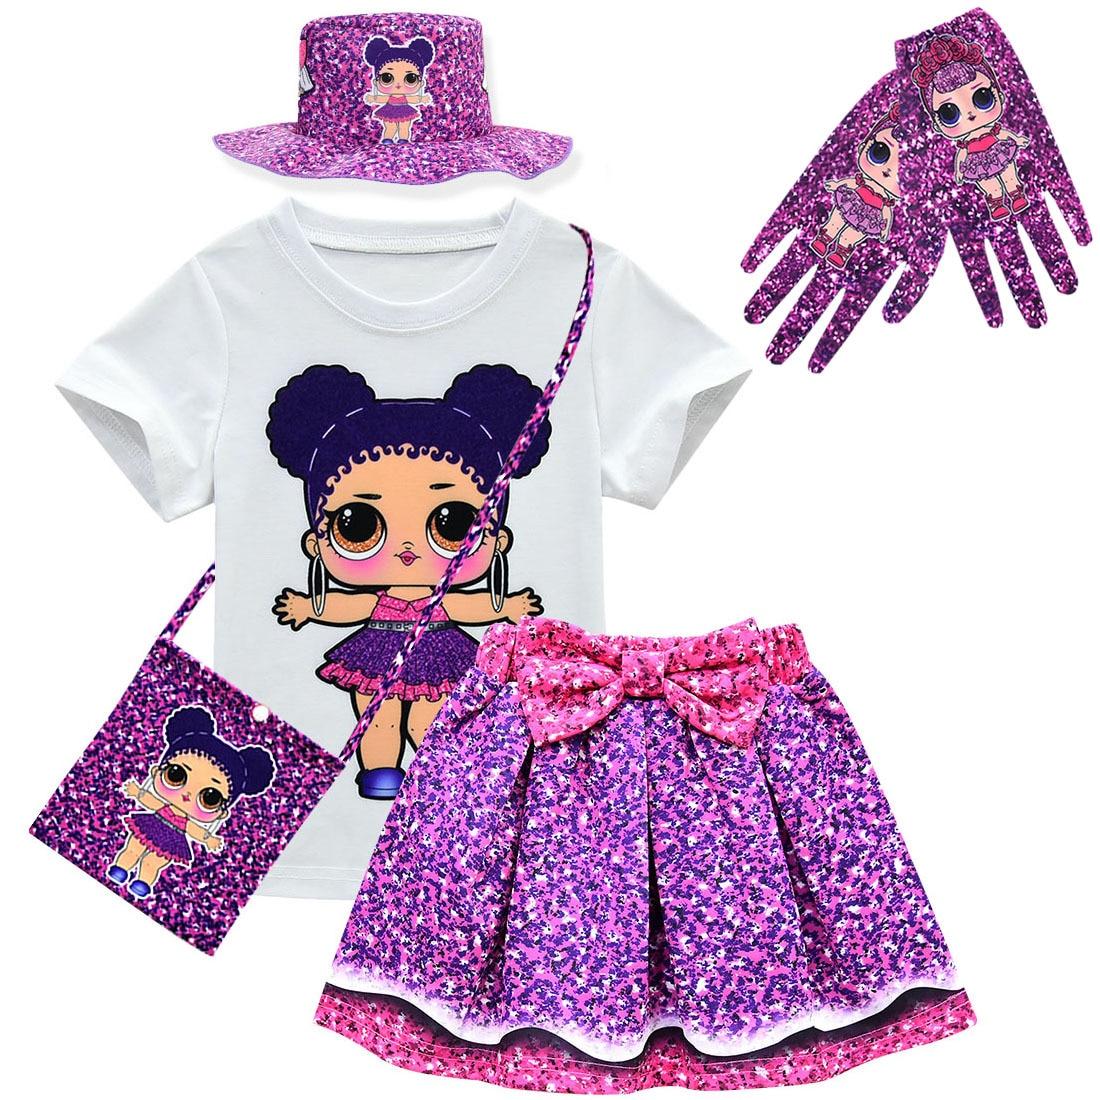 Lol doll sorpresa modelo original juguetes chica camiseta + falda conjunto Lol vestidos para niña chico muñeca dibujos animados princesa niñas vestido